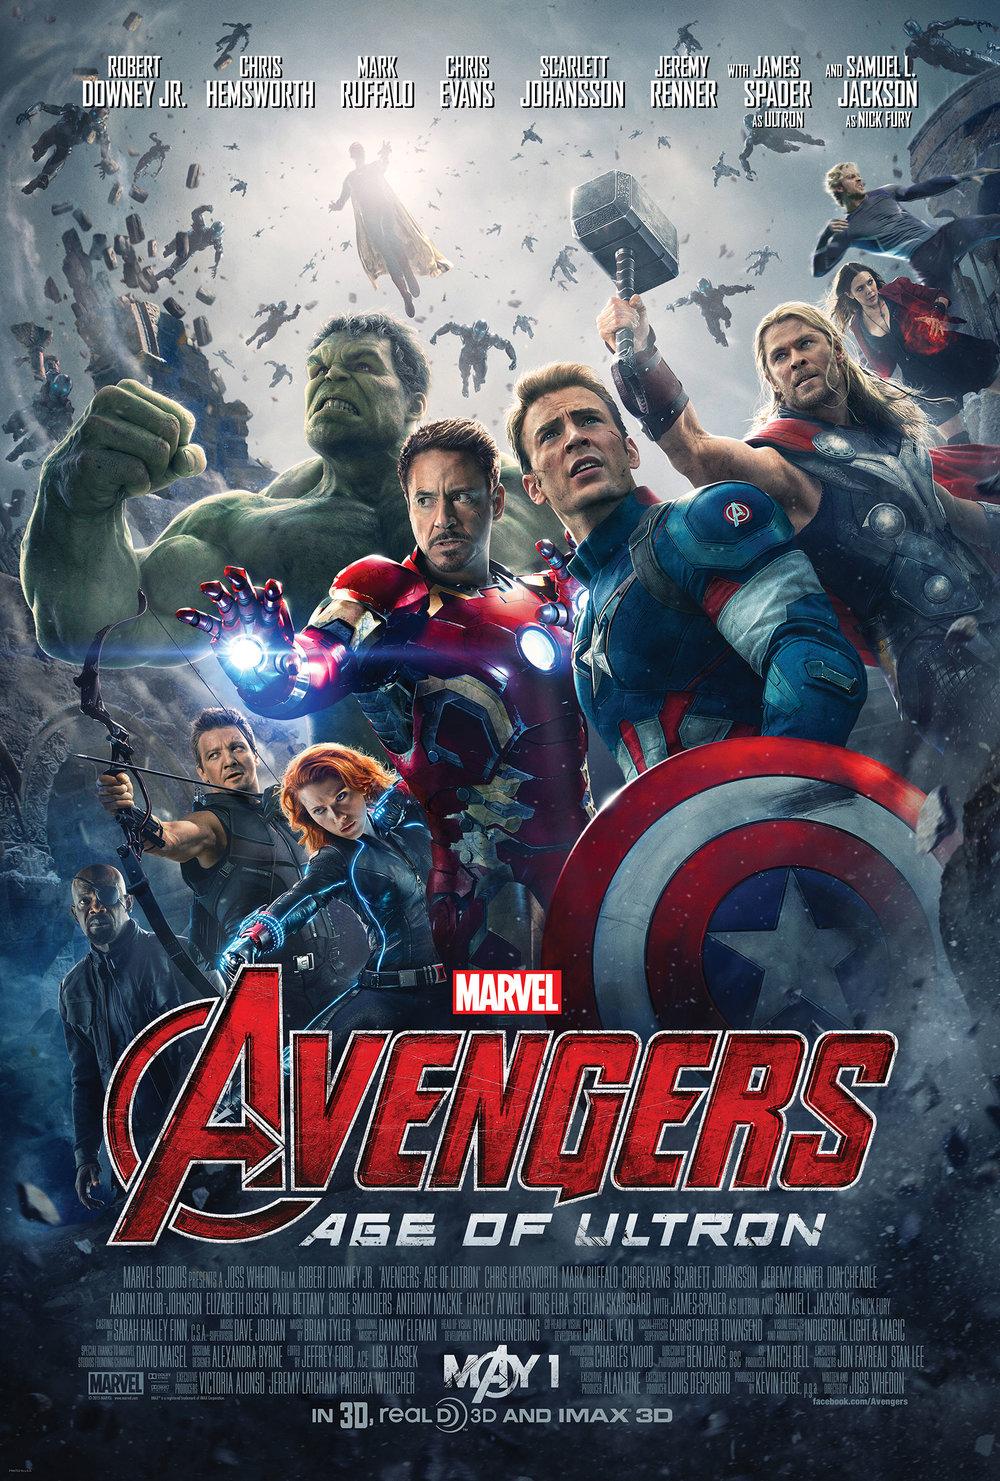 avengers-2-movie-poster-marvel-cinematic-universe-1038898.jpg